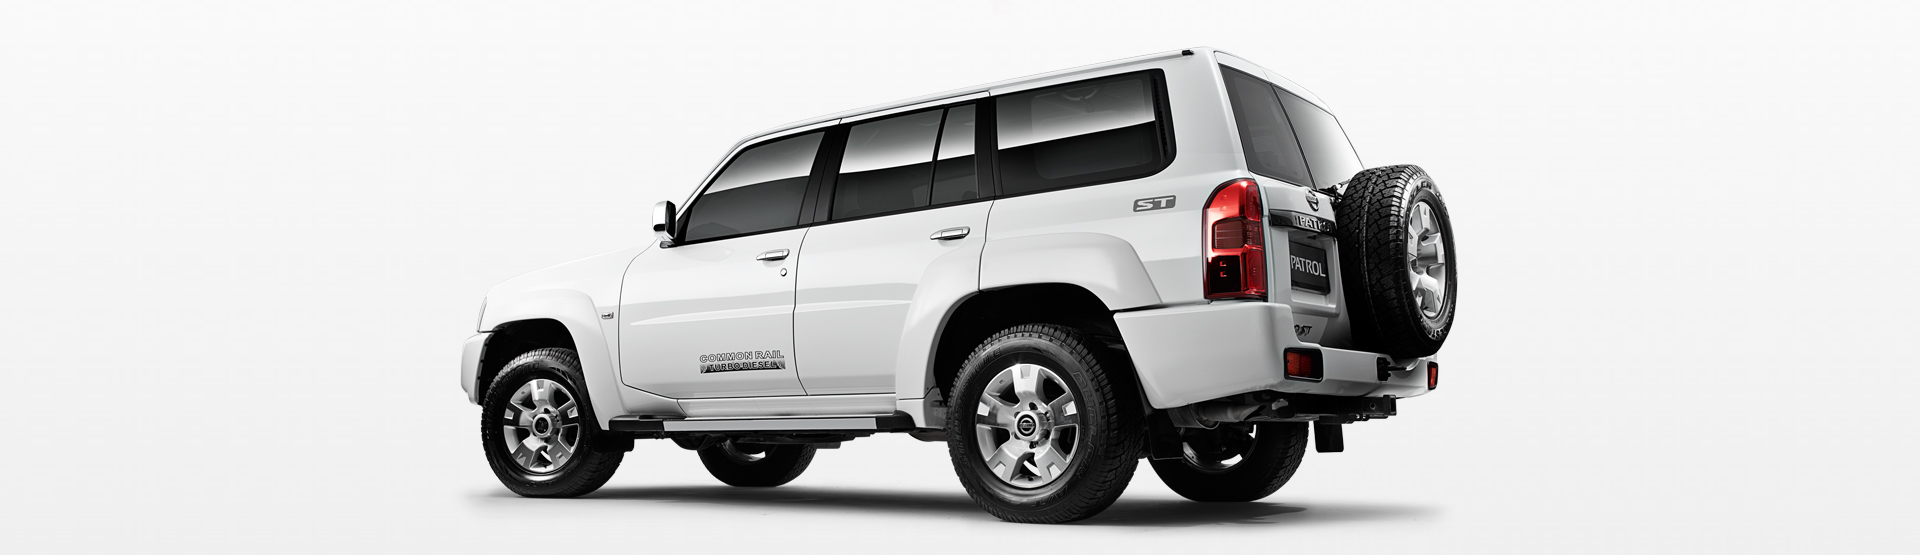 New Nissan Patrol Y61 for sale in Sunshine Coast - Sunshine Coast Nissan